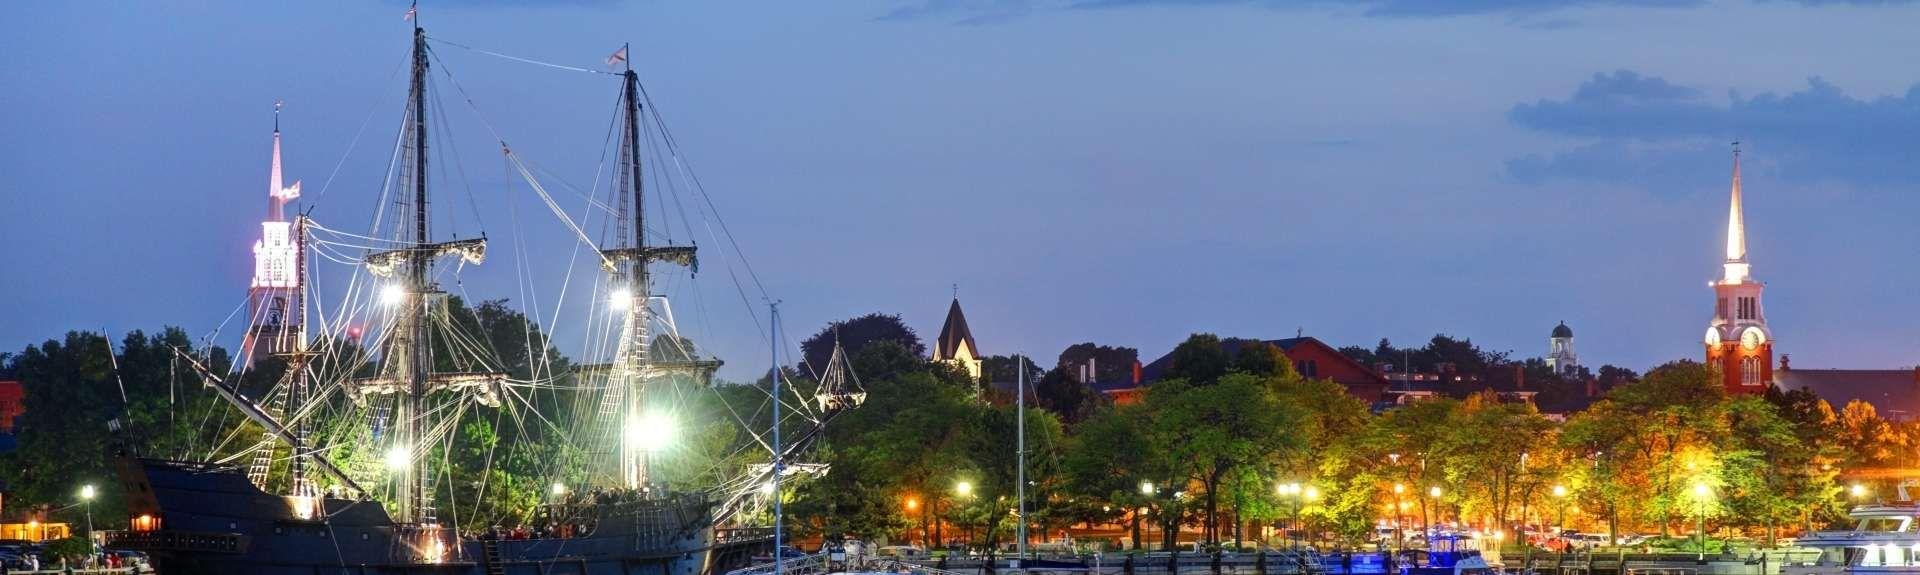 Georgetown, Massachusetts, USA